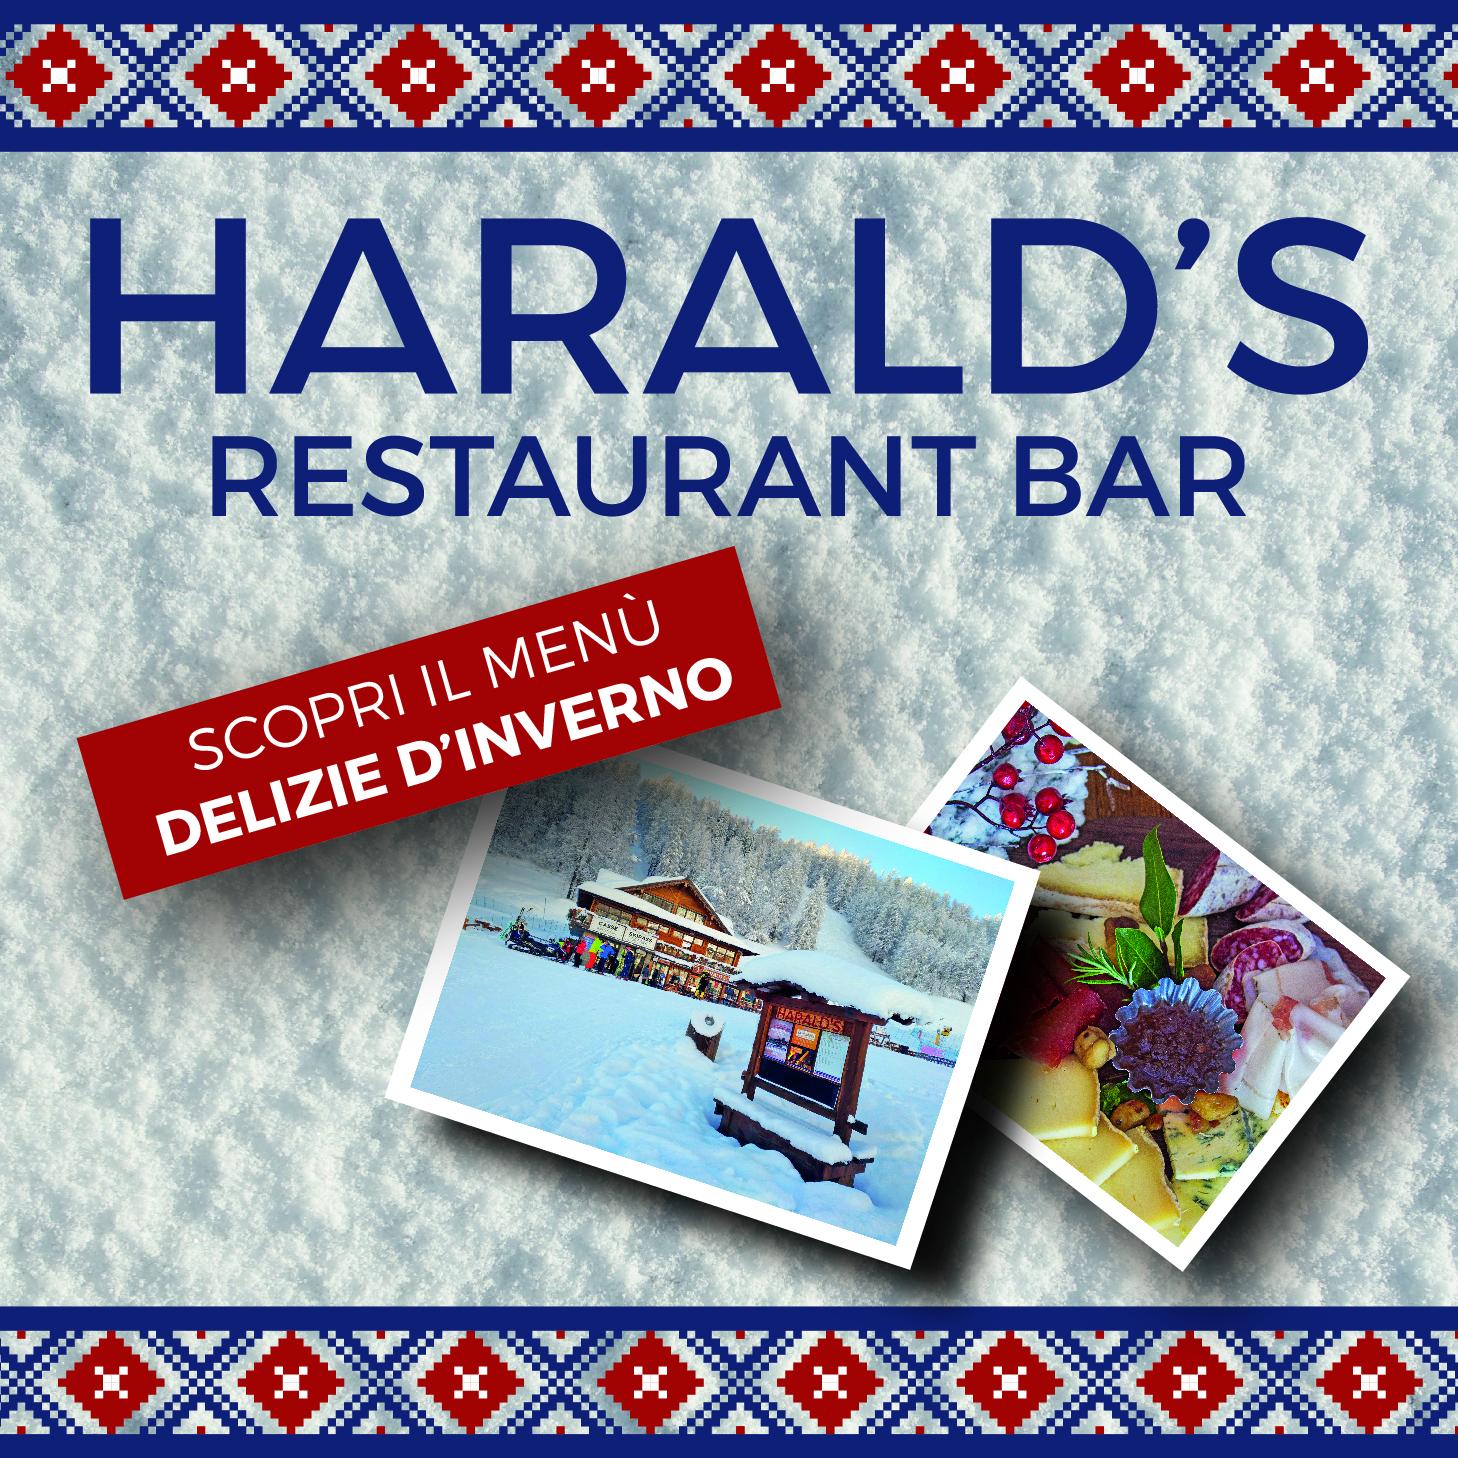 HARALDS INVERNO